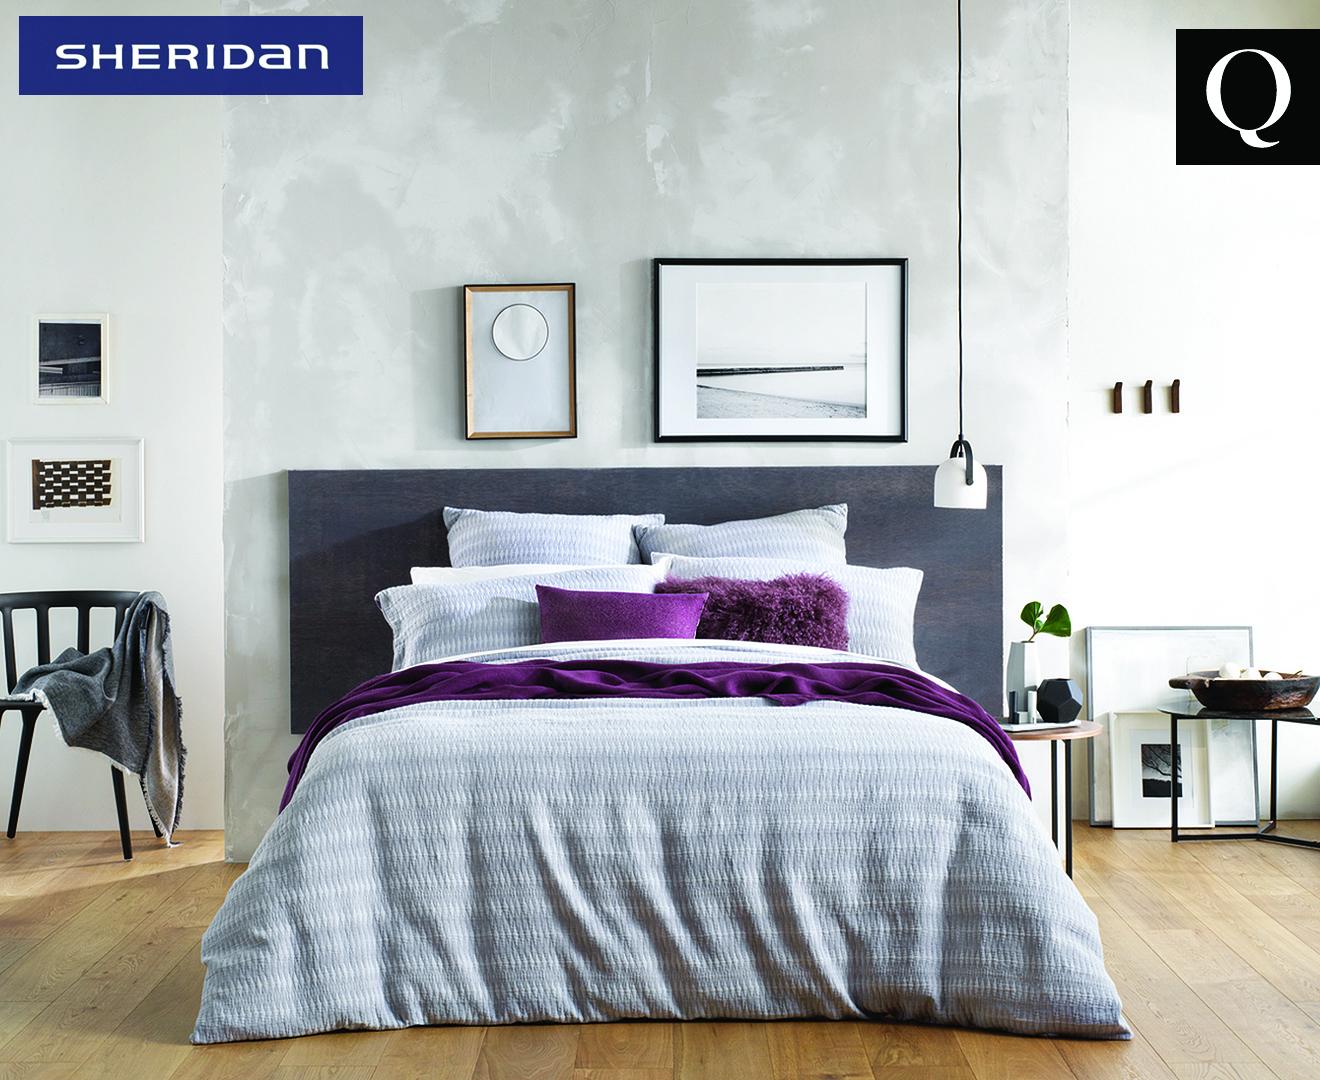 Sheridan Docklands Queen Bed Quilt Cover - Stone Grey